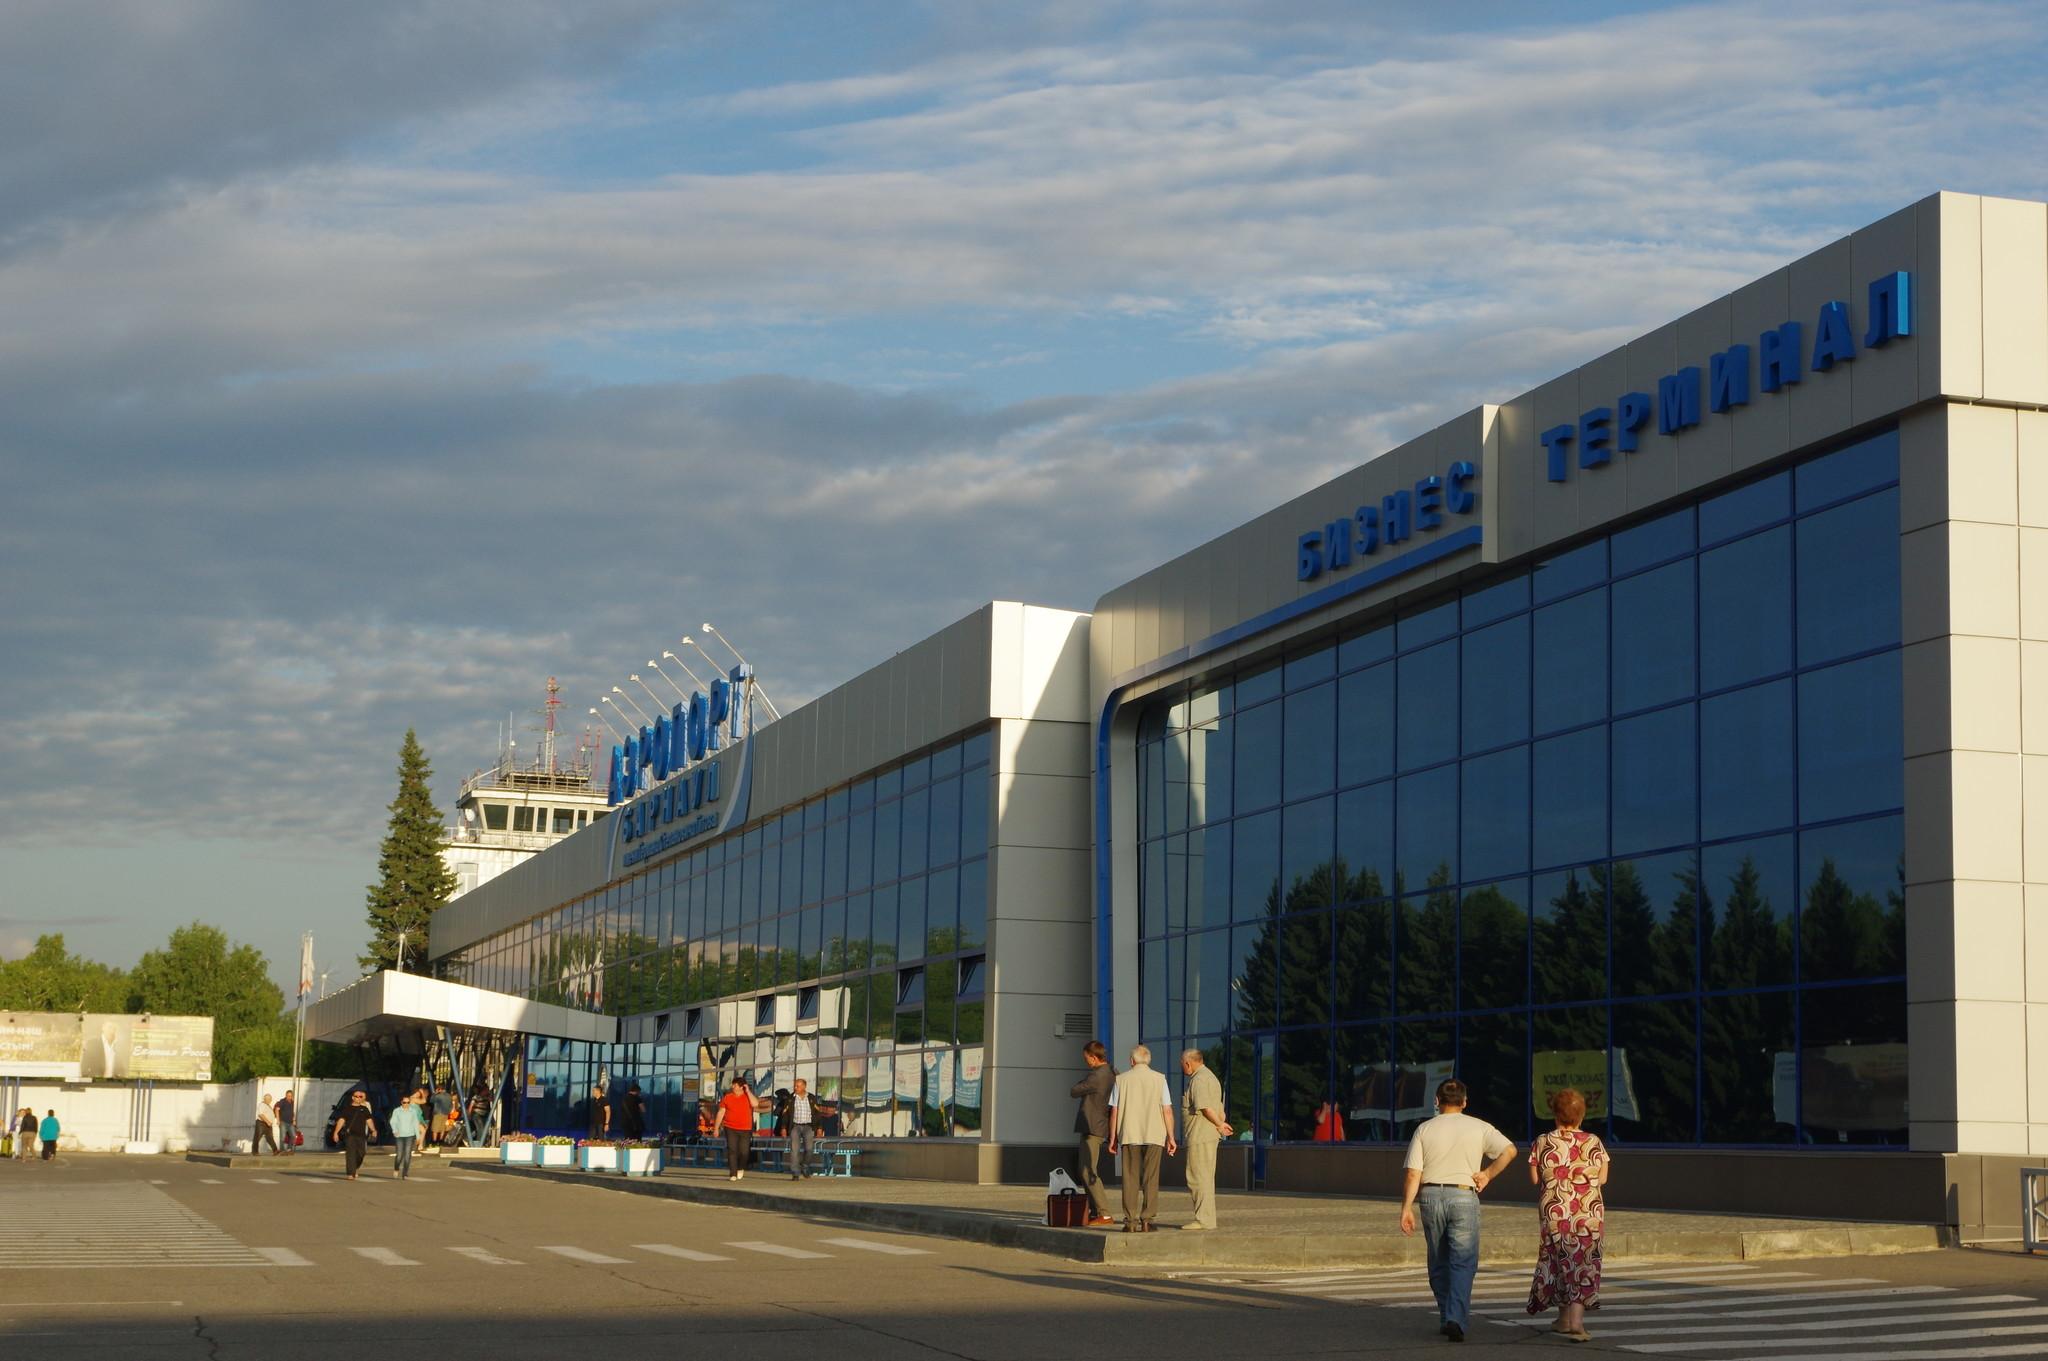 Международный аэропорт Барнаул имени Германа Титова